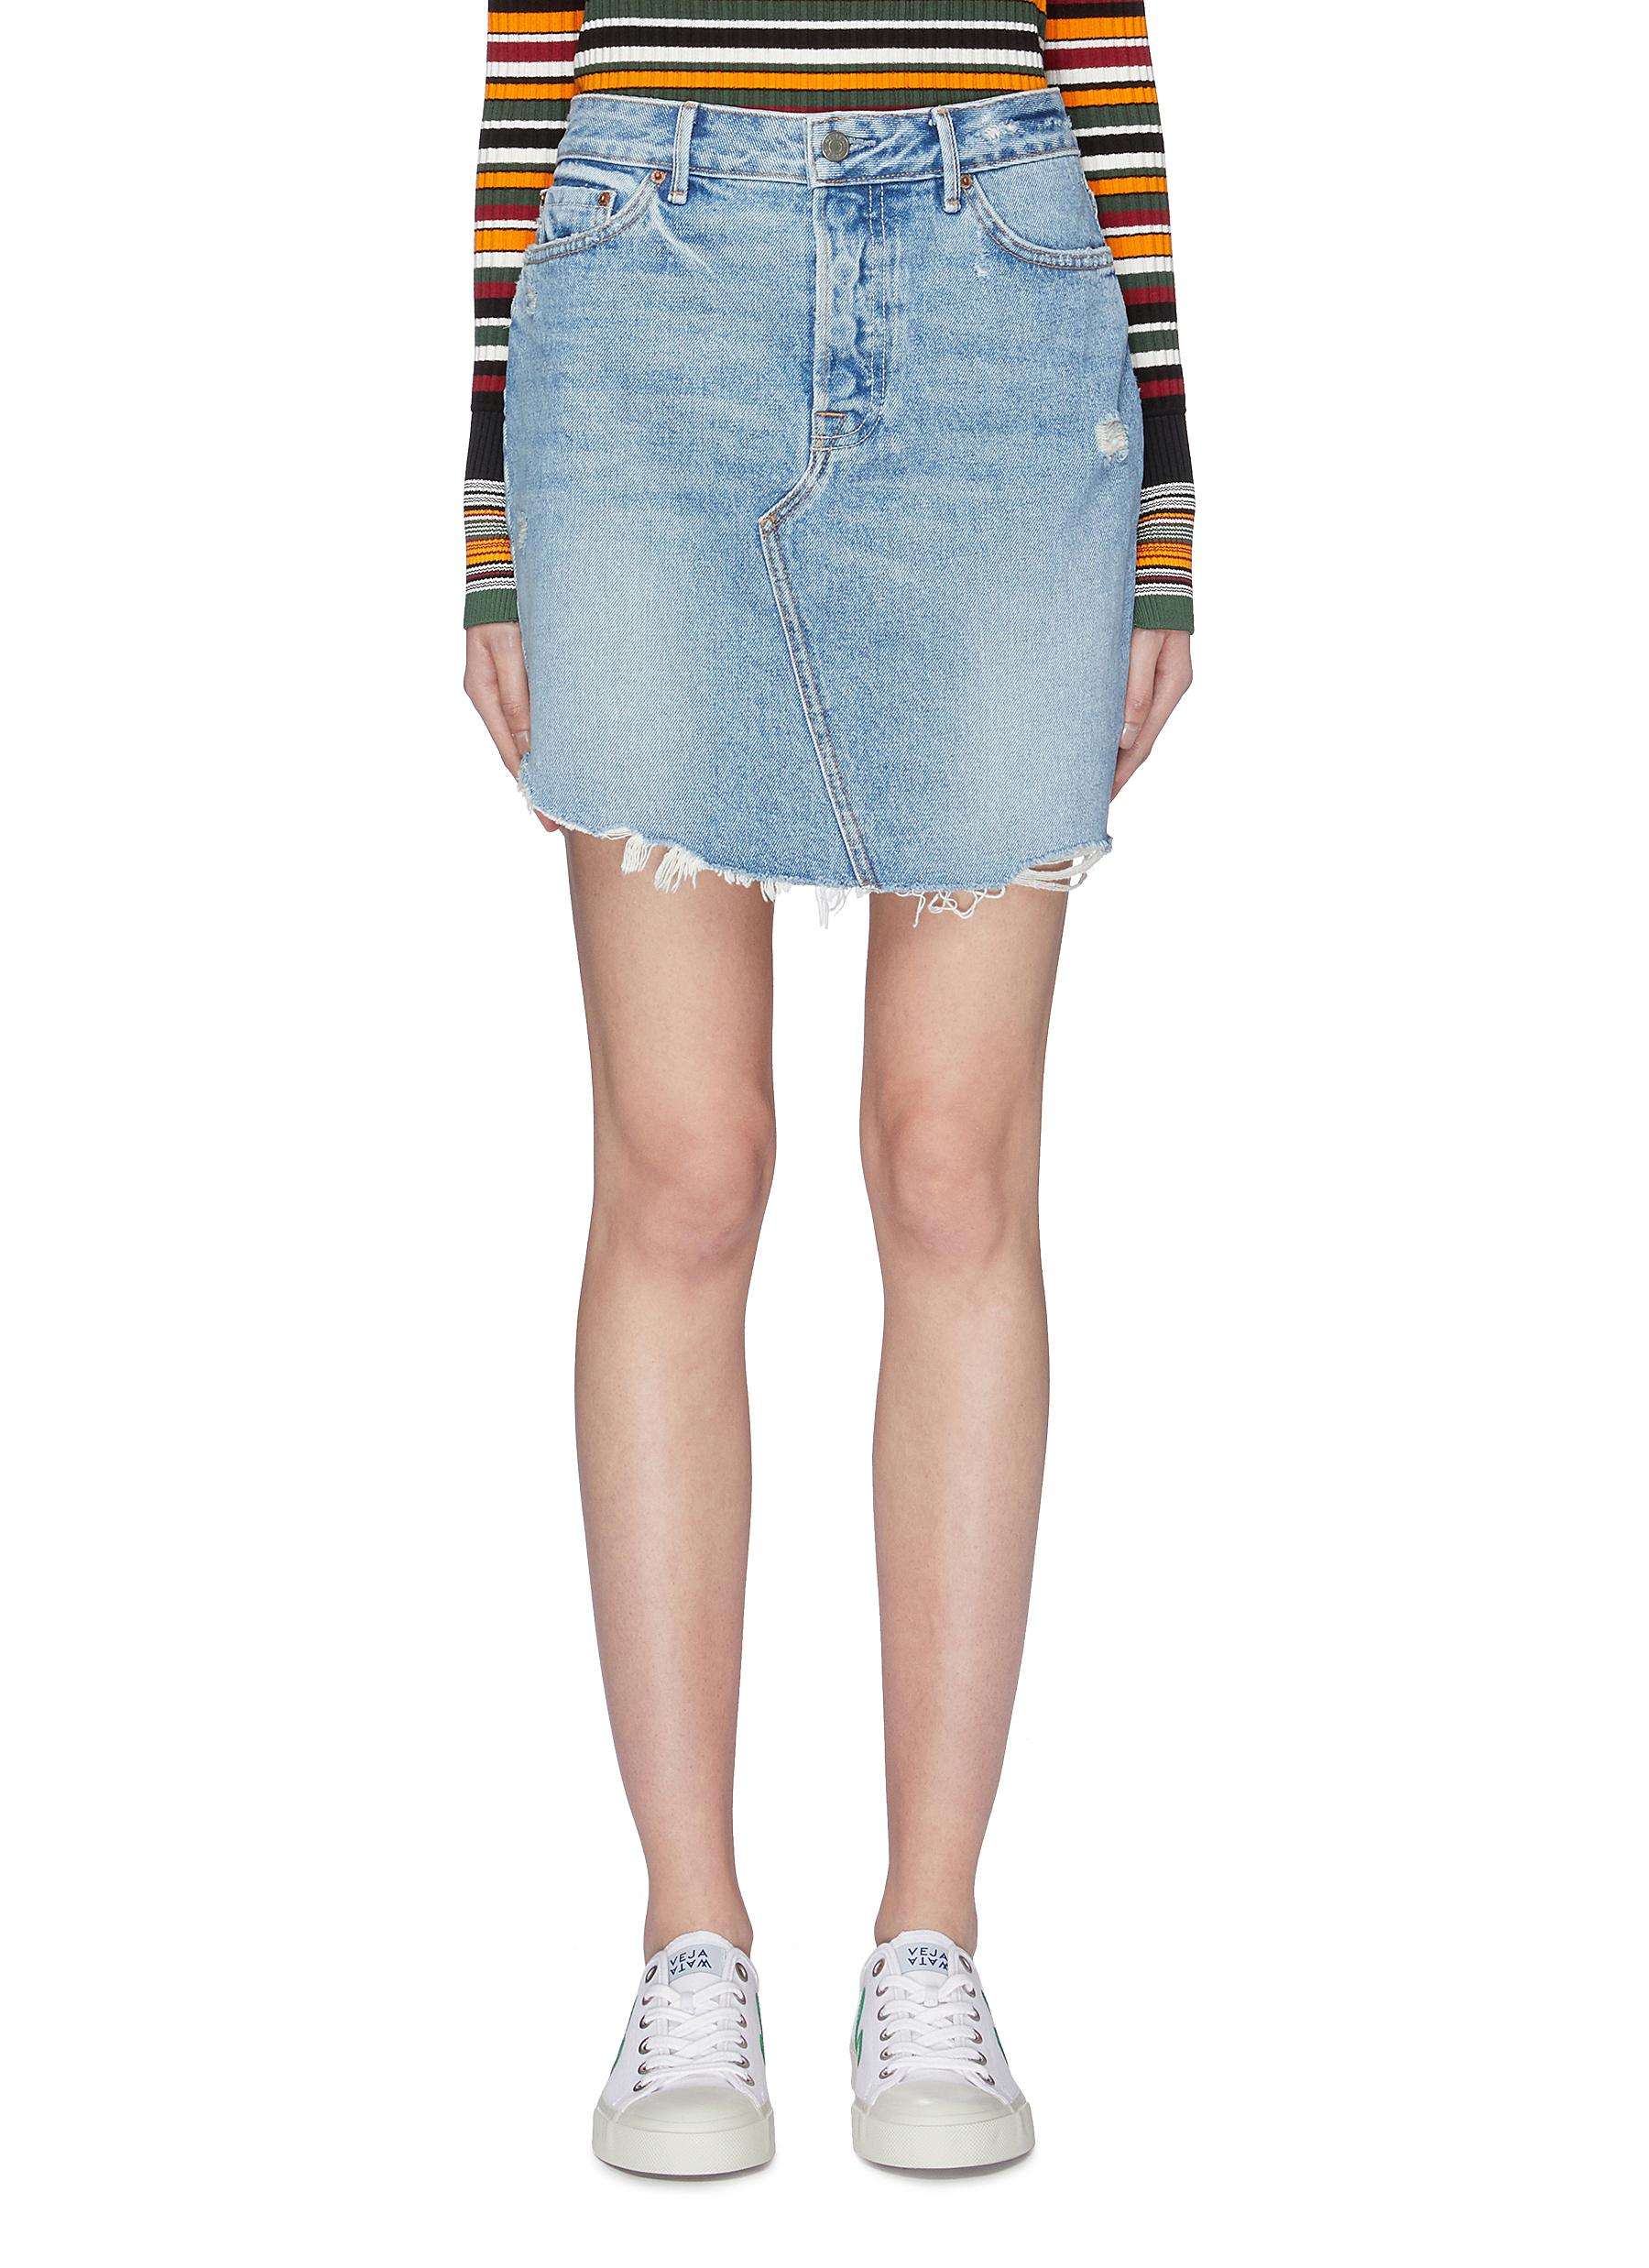 37e05b0046 Denim Jeans for Men and Women - Denim Fit